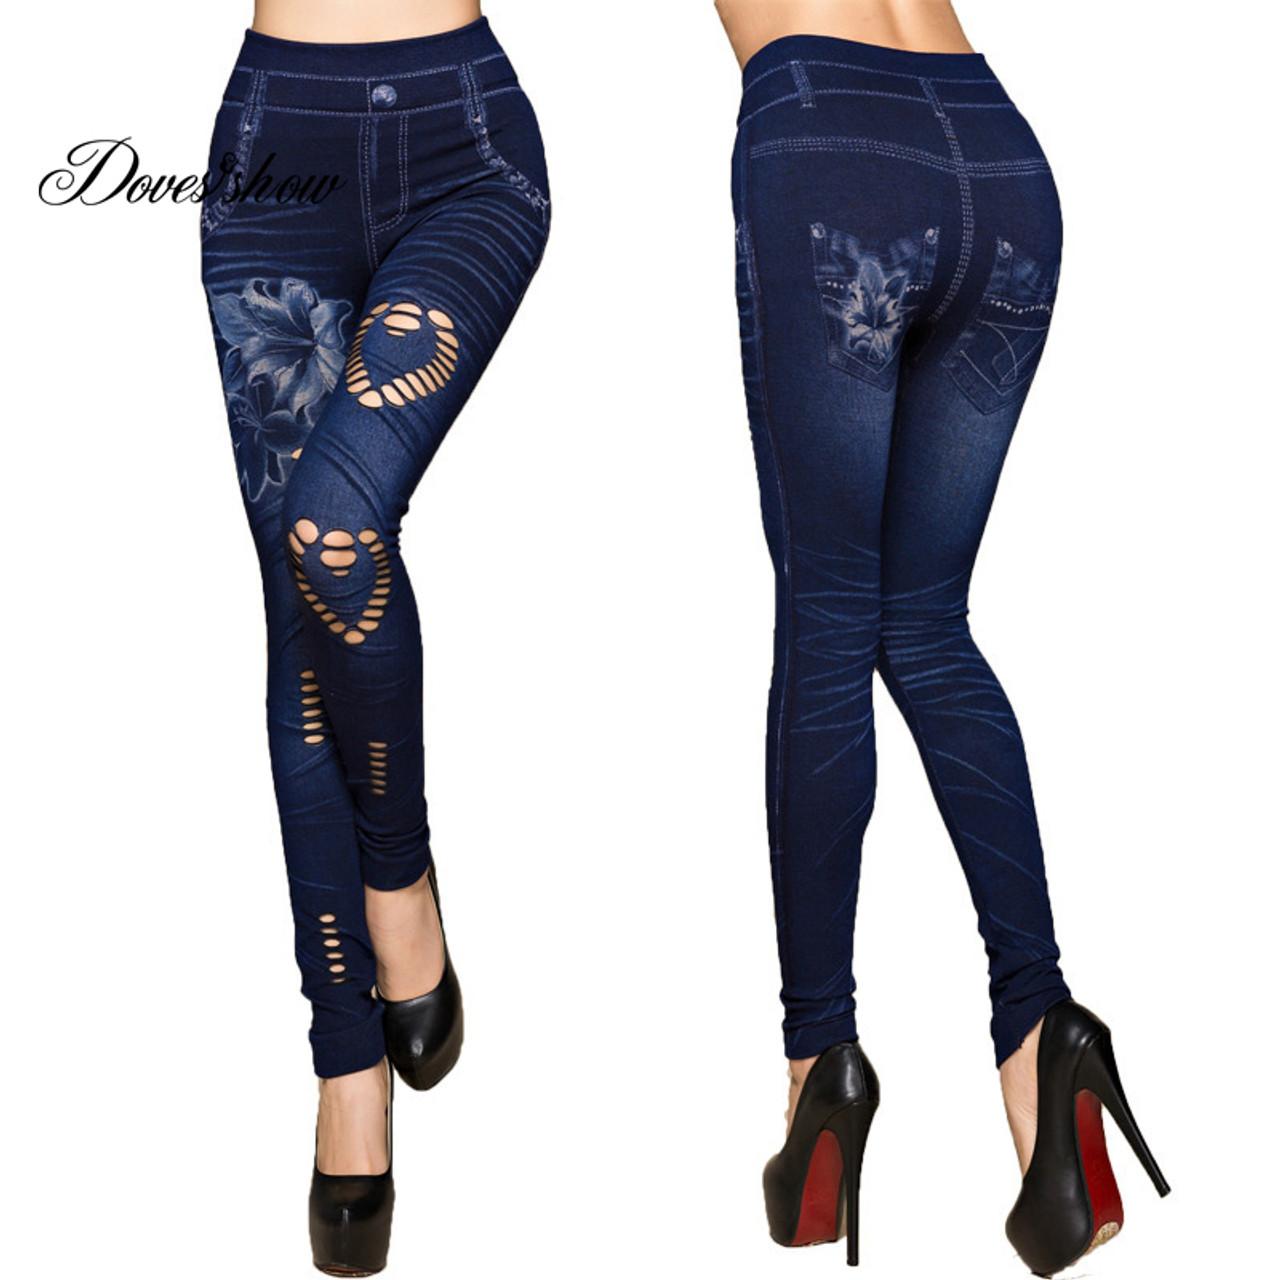 Womens New Fashion Denim Leggings Skinny Pants Rose Embroidered Print Jean 5XL